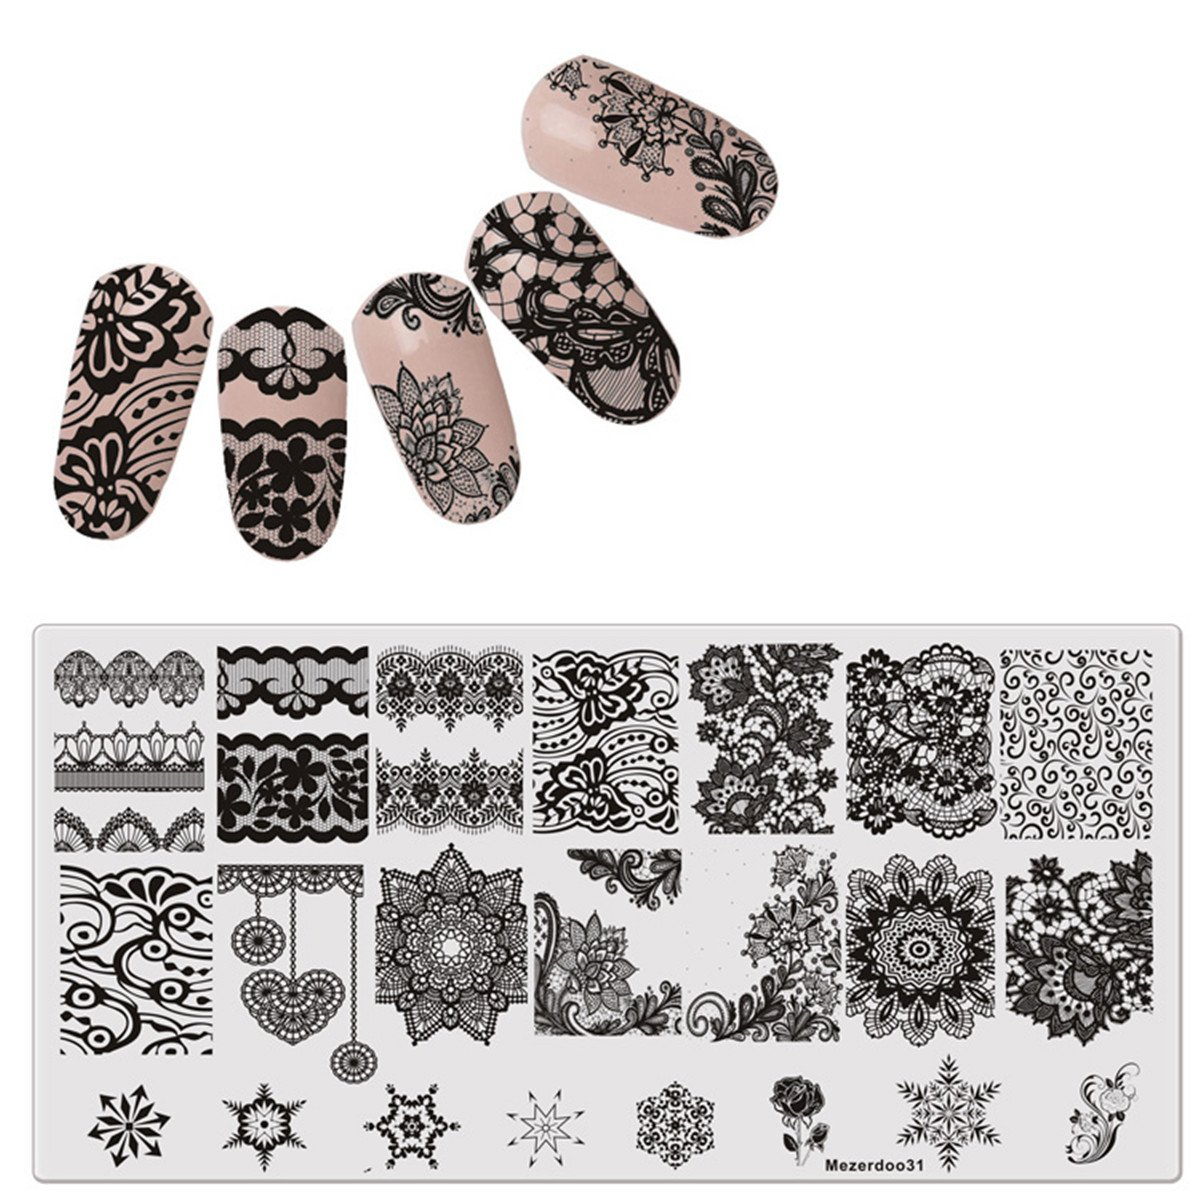 Amazon.com : Born Pretty Nail Art Stamping Template Image Plate Lace ...